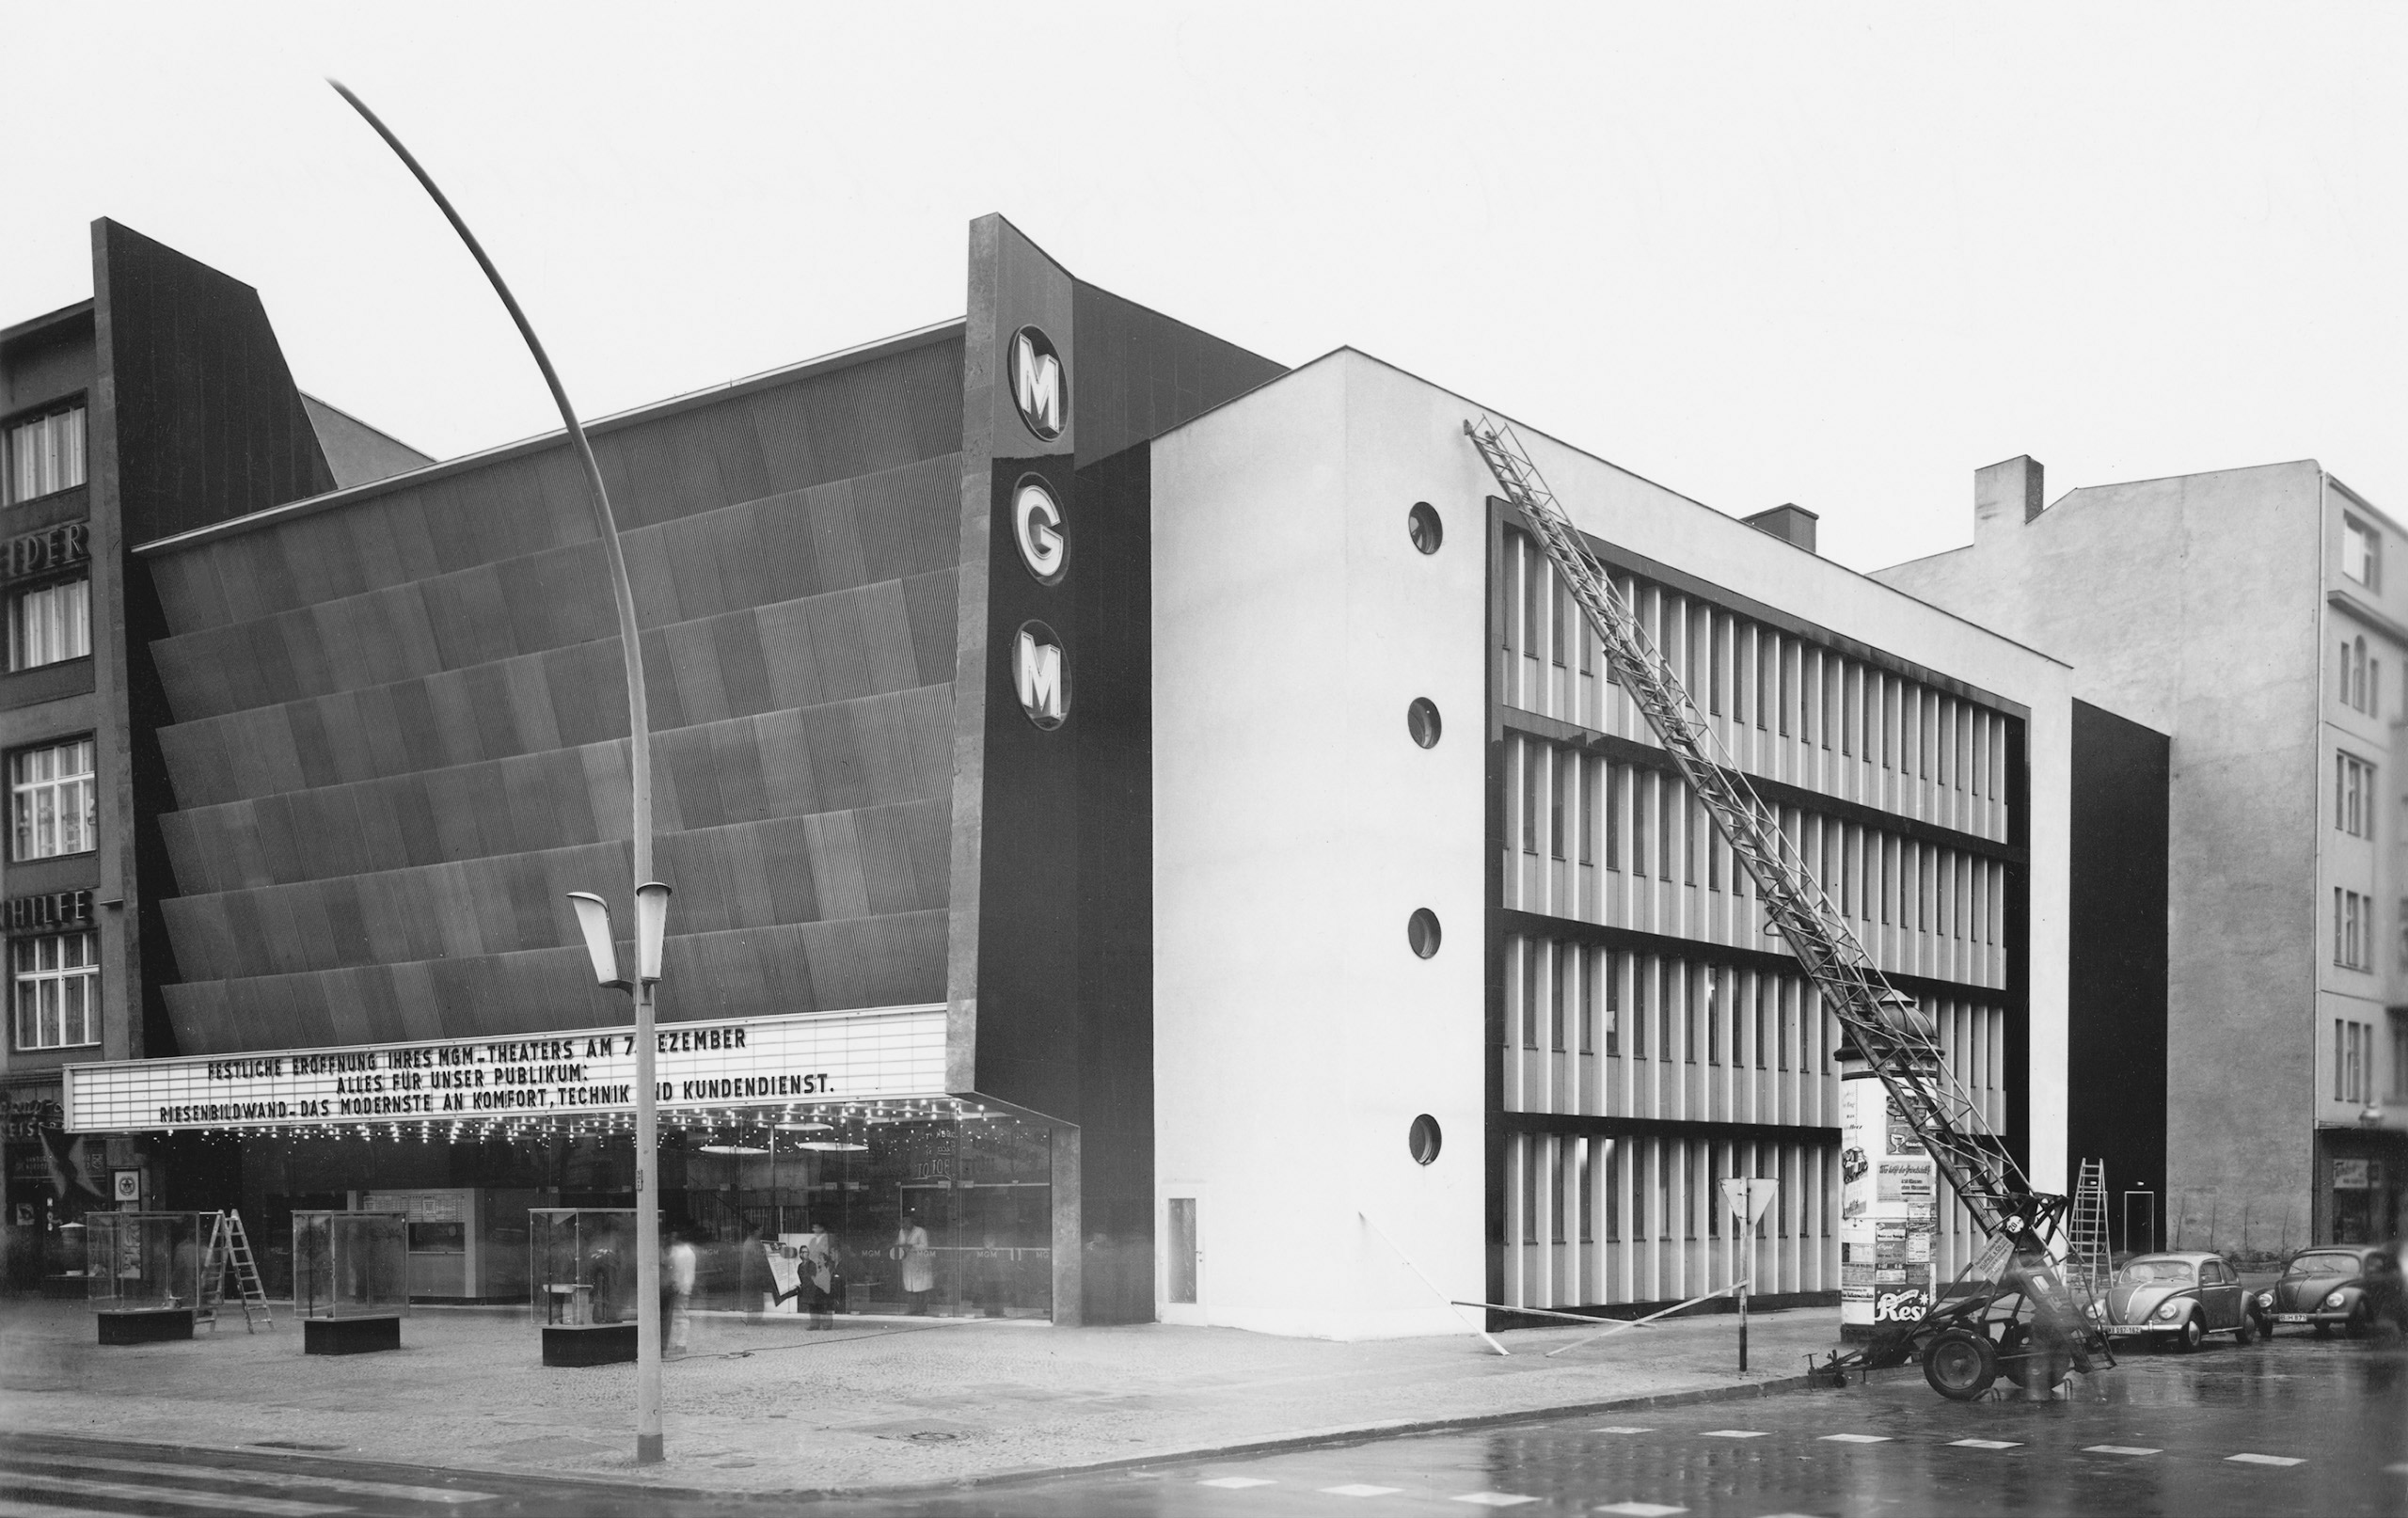 Black and white photo: cinema façade display panel